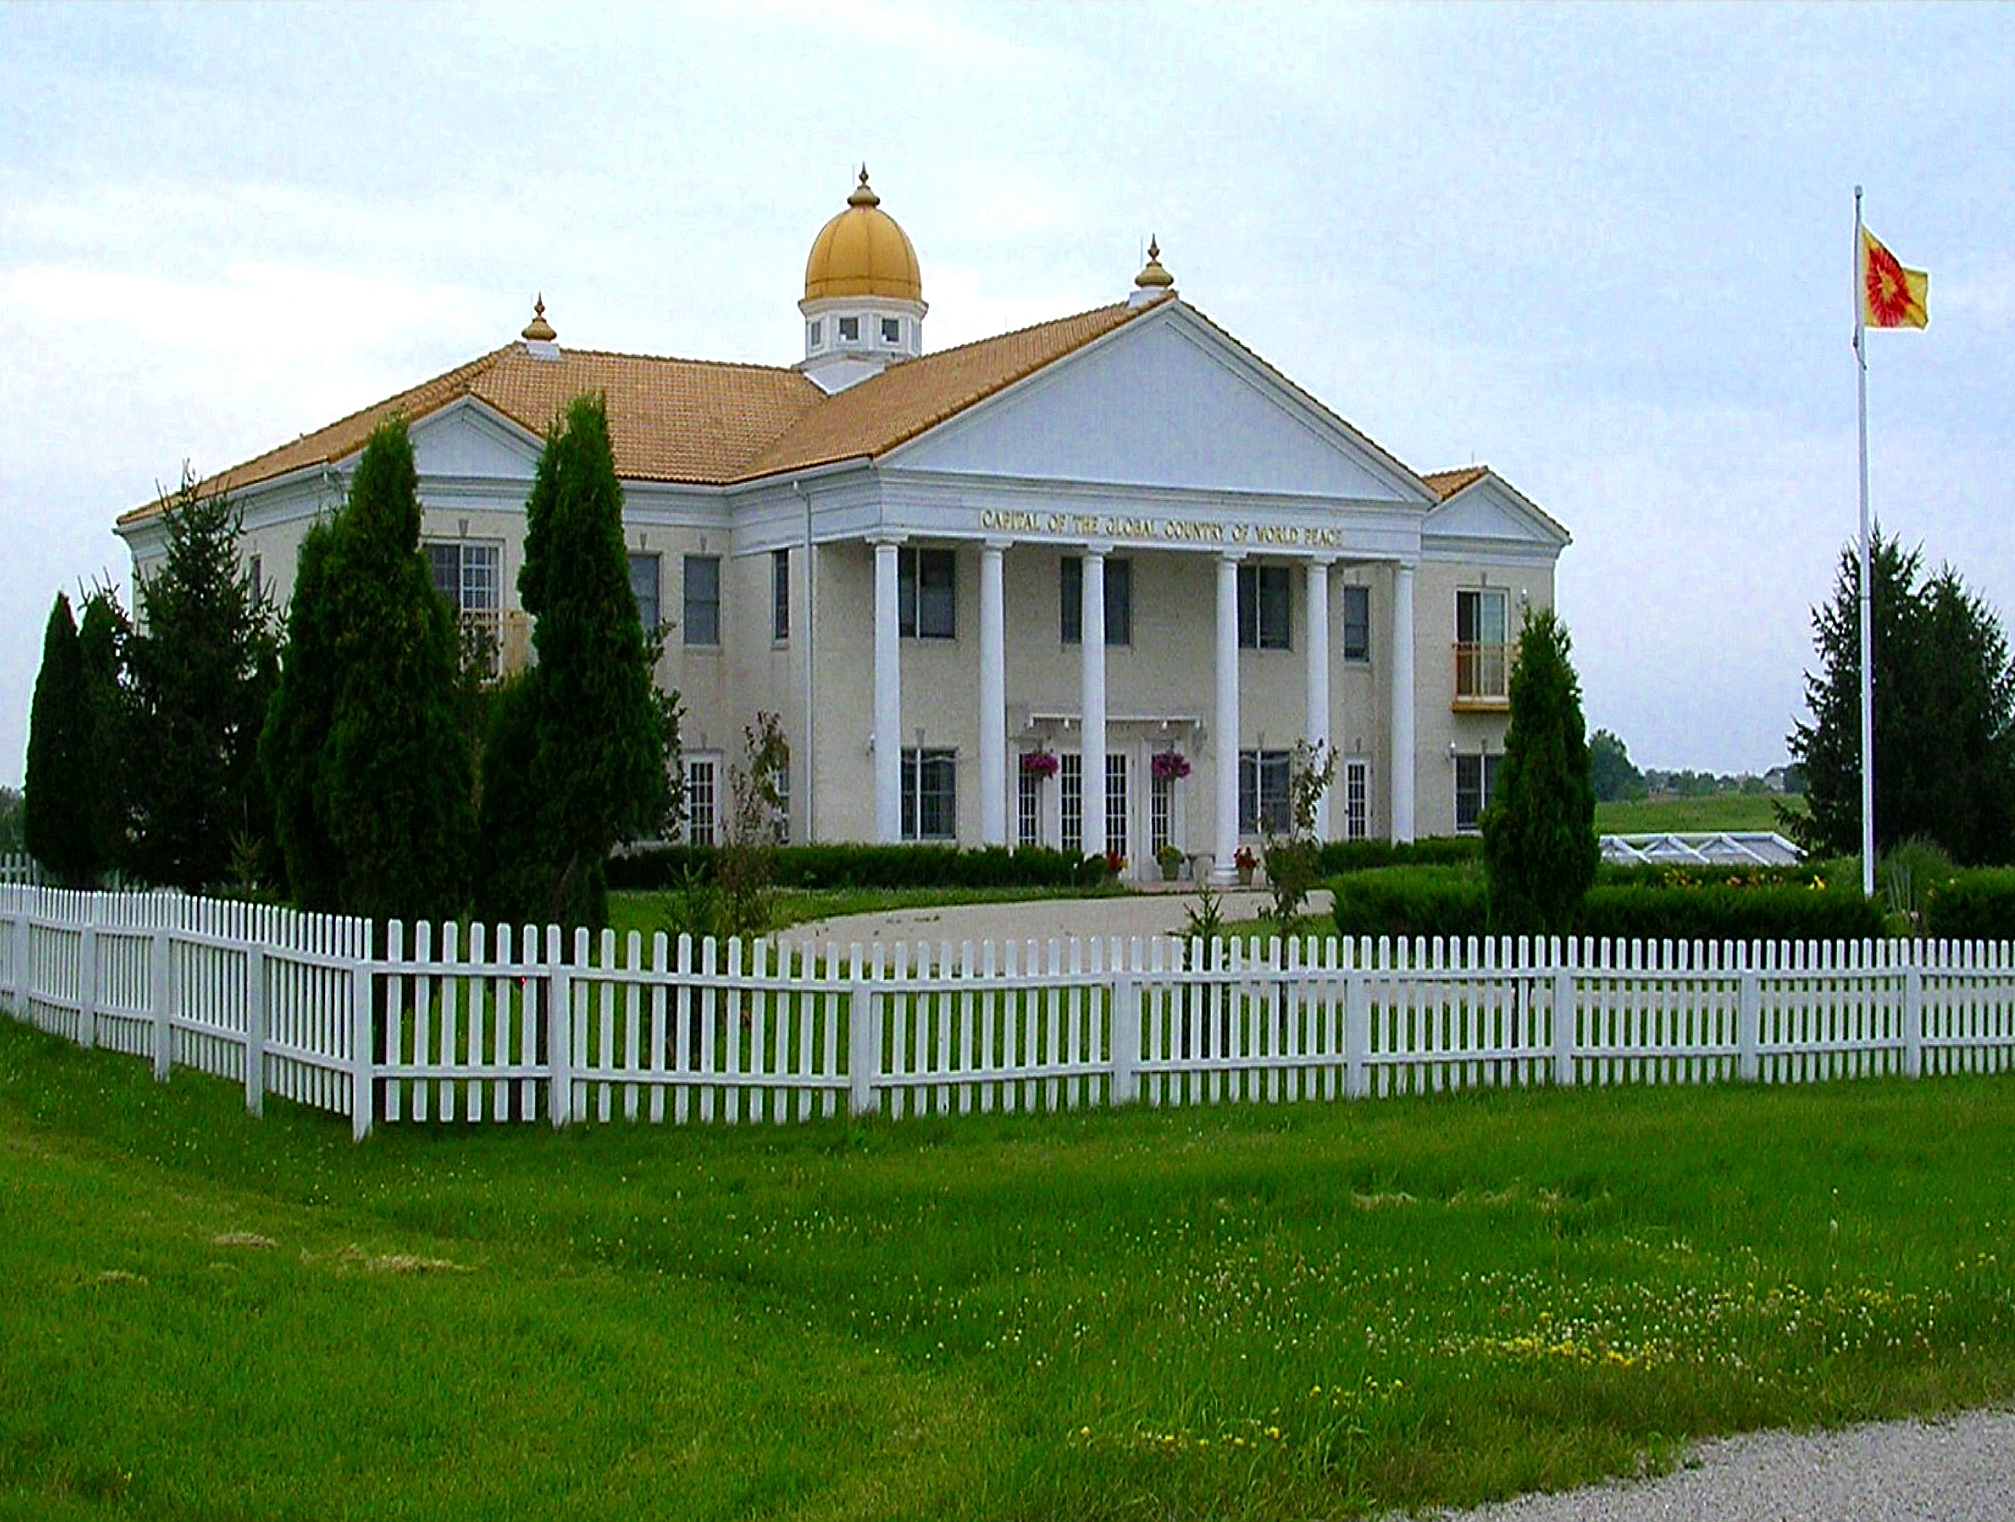 Maharishi Vastu Architecture - Wikipedia